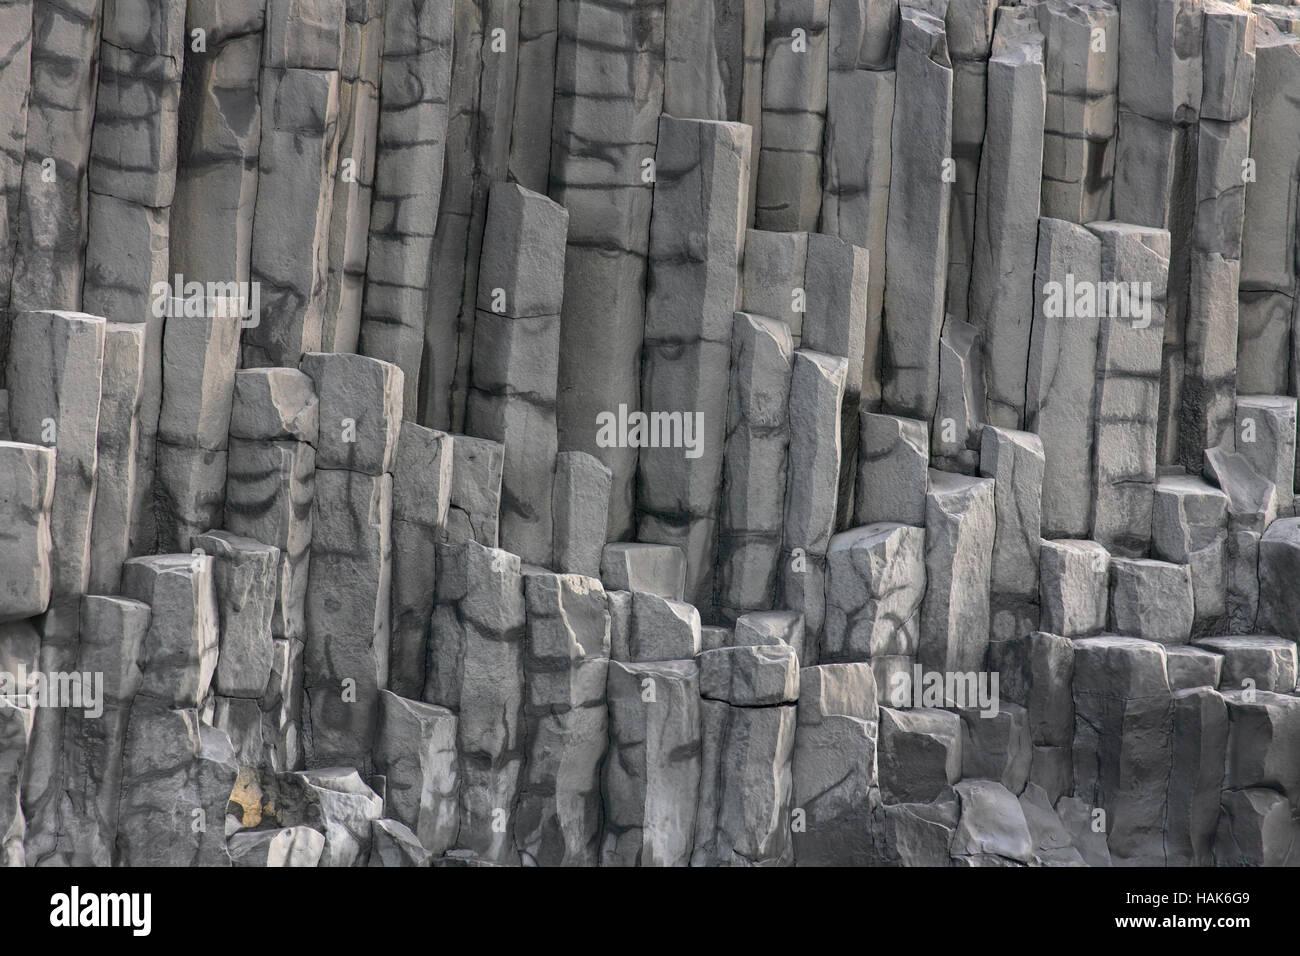 Hexagonal basalt columns, volcanic rock formations near the village Vík í Mýrdal, southern Iceland - Stock Image